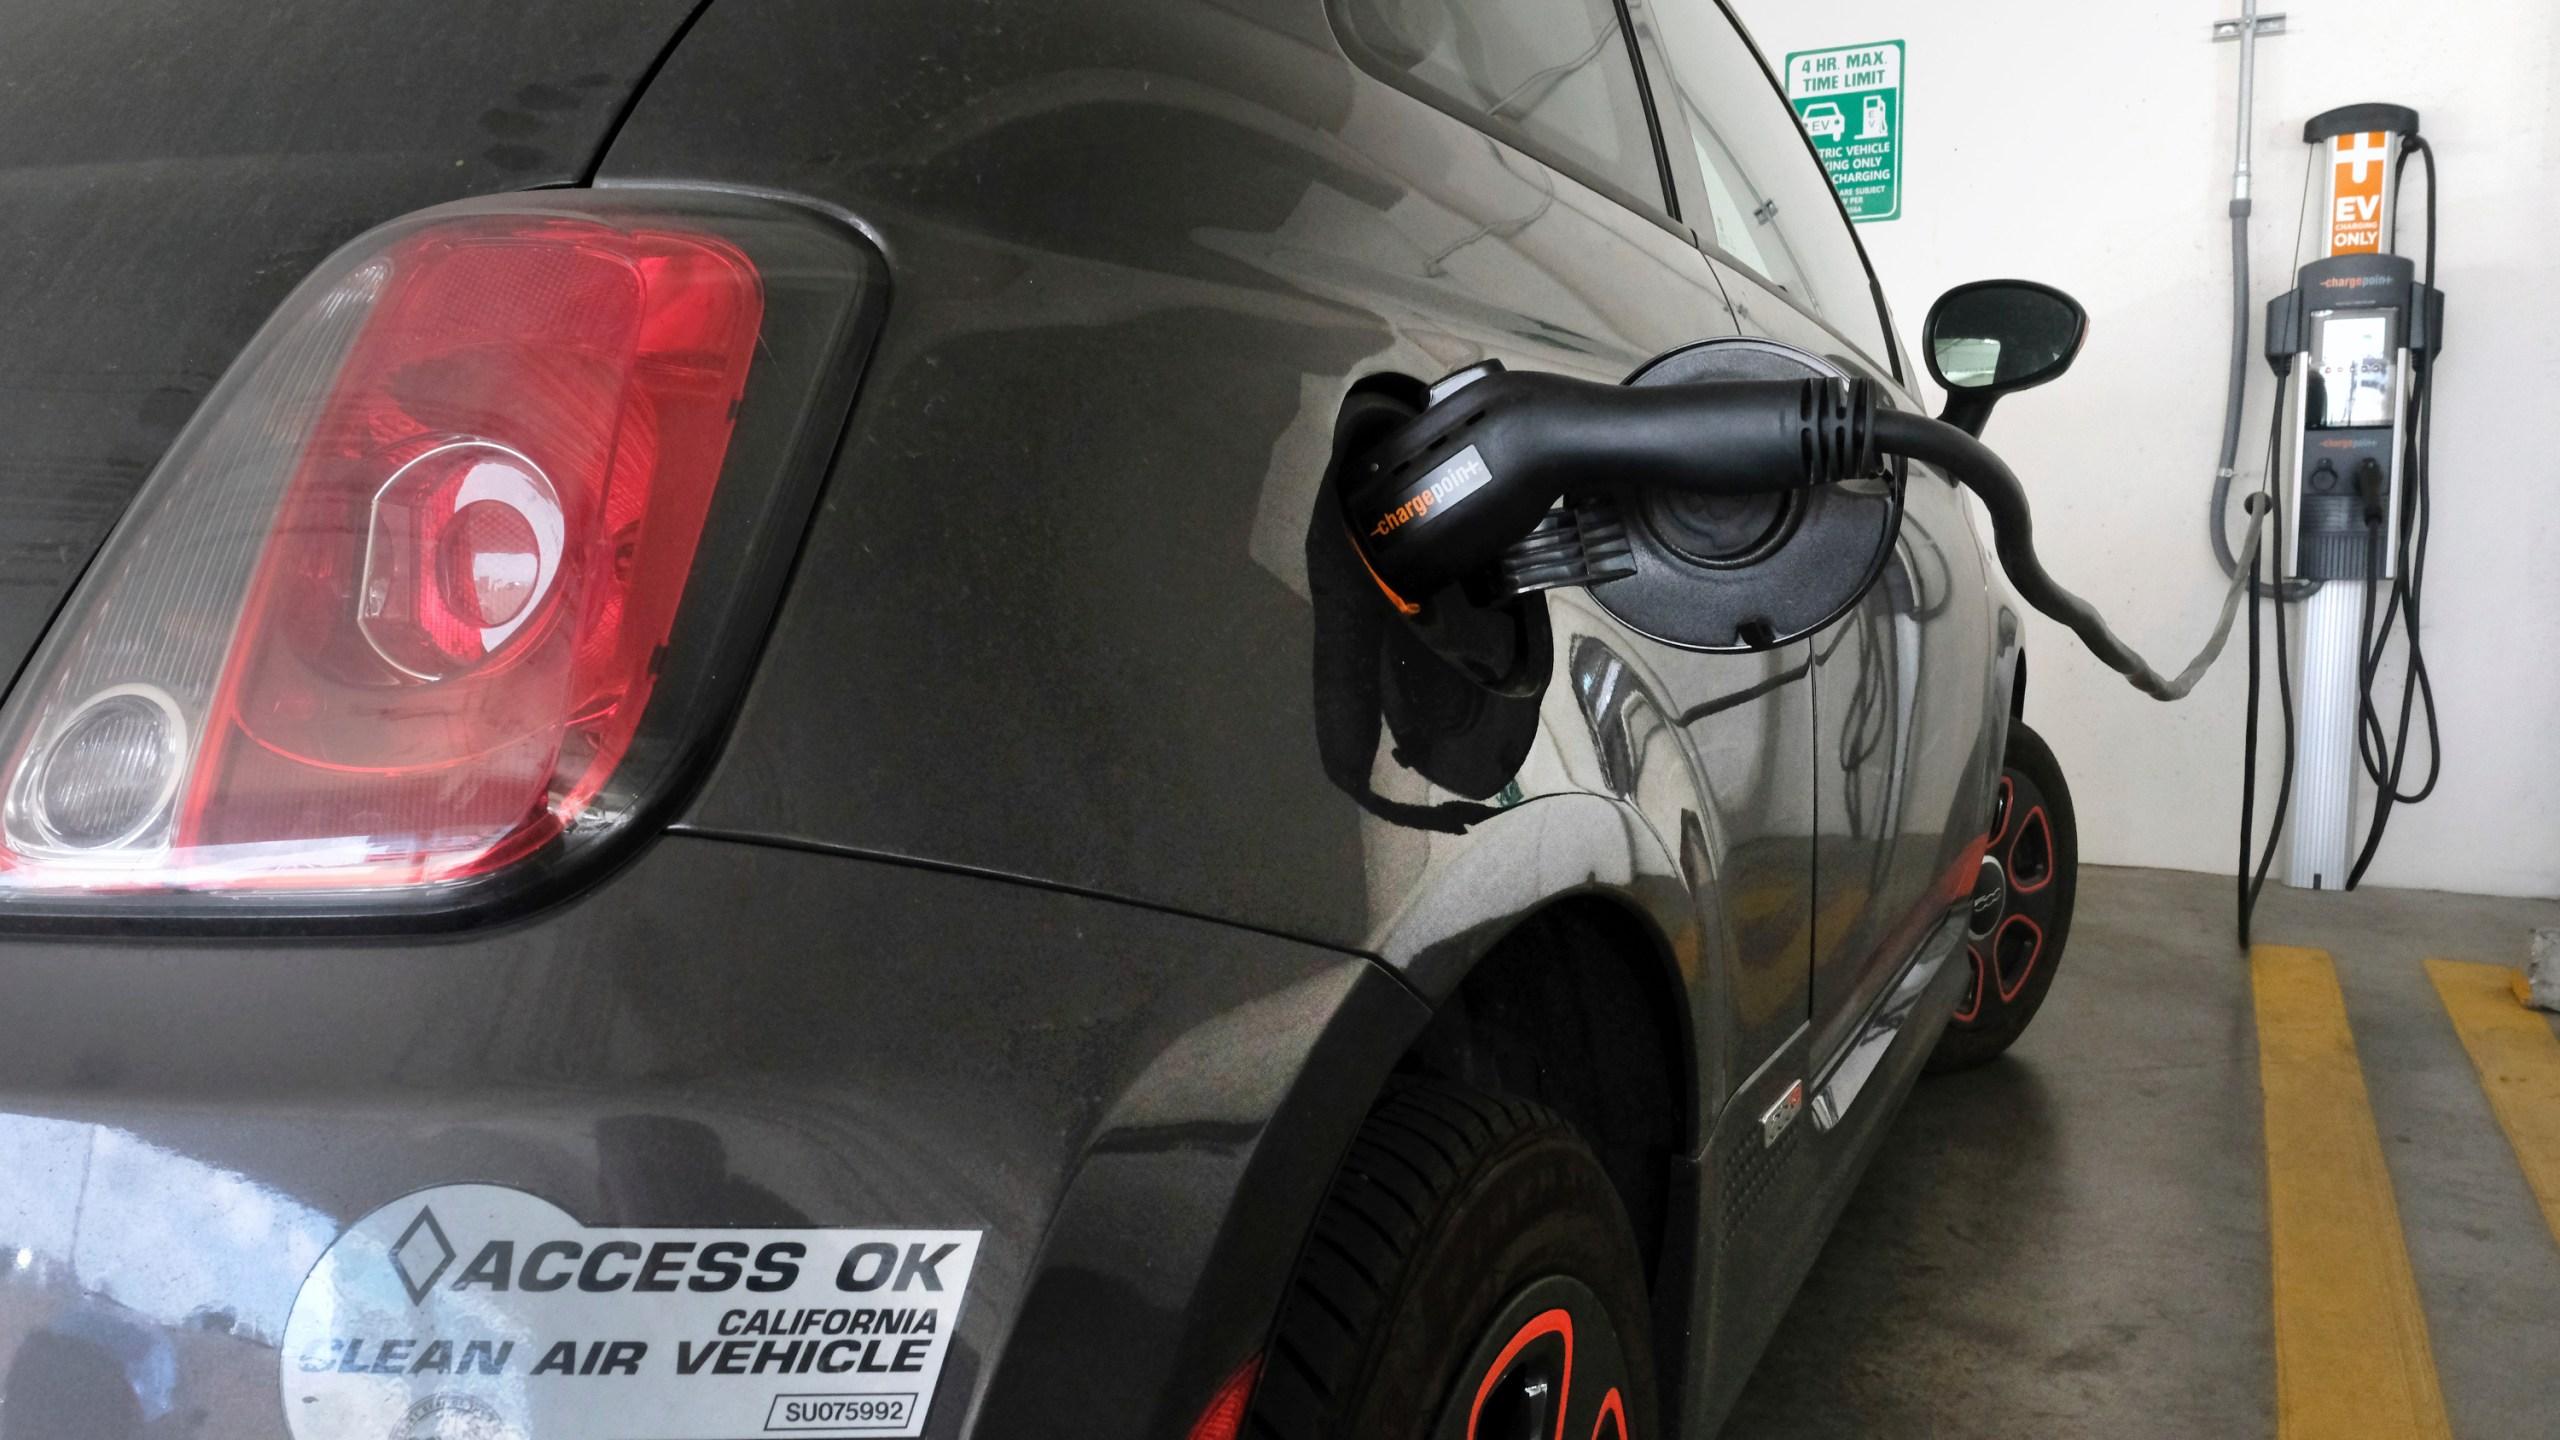 Electric_Vehicles_California_72685-159532.jpg64331854